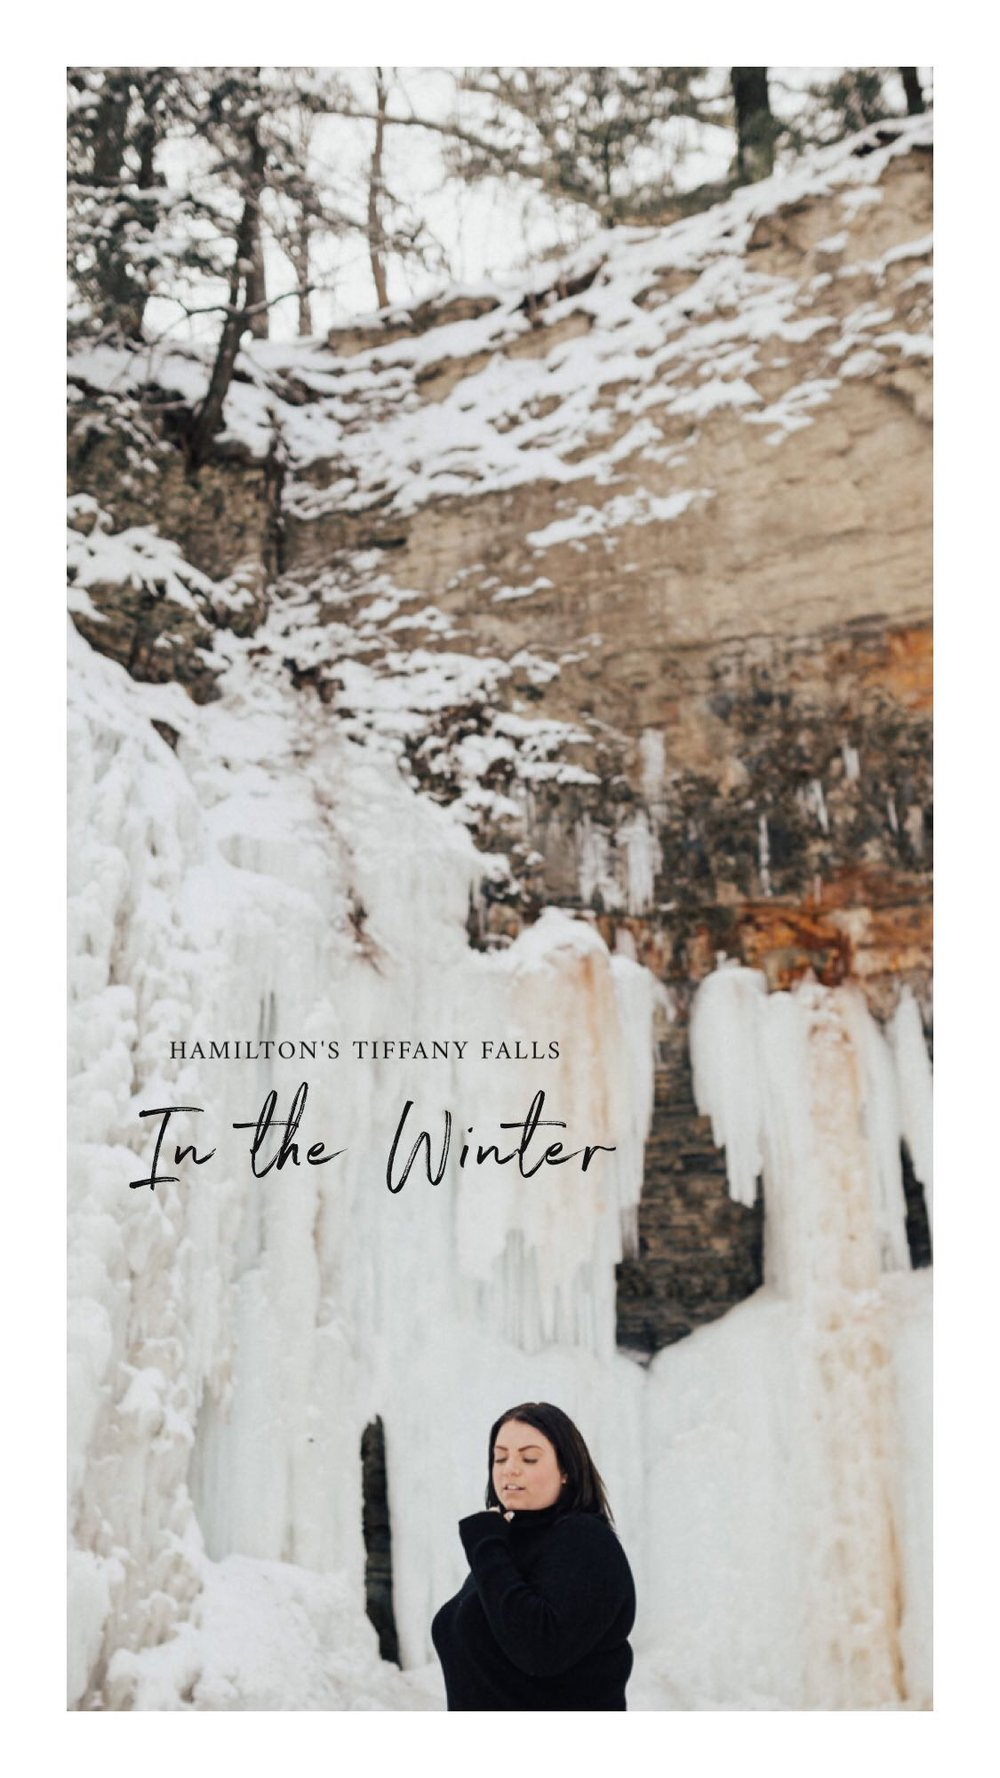 tiffany falls, hamilton - frozen waterfalls, snowy trails + sensational views.